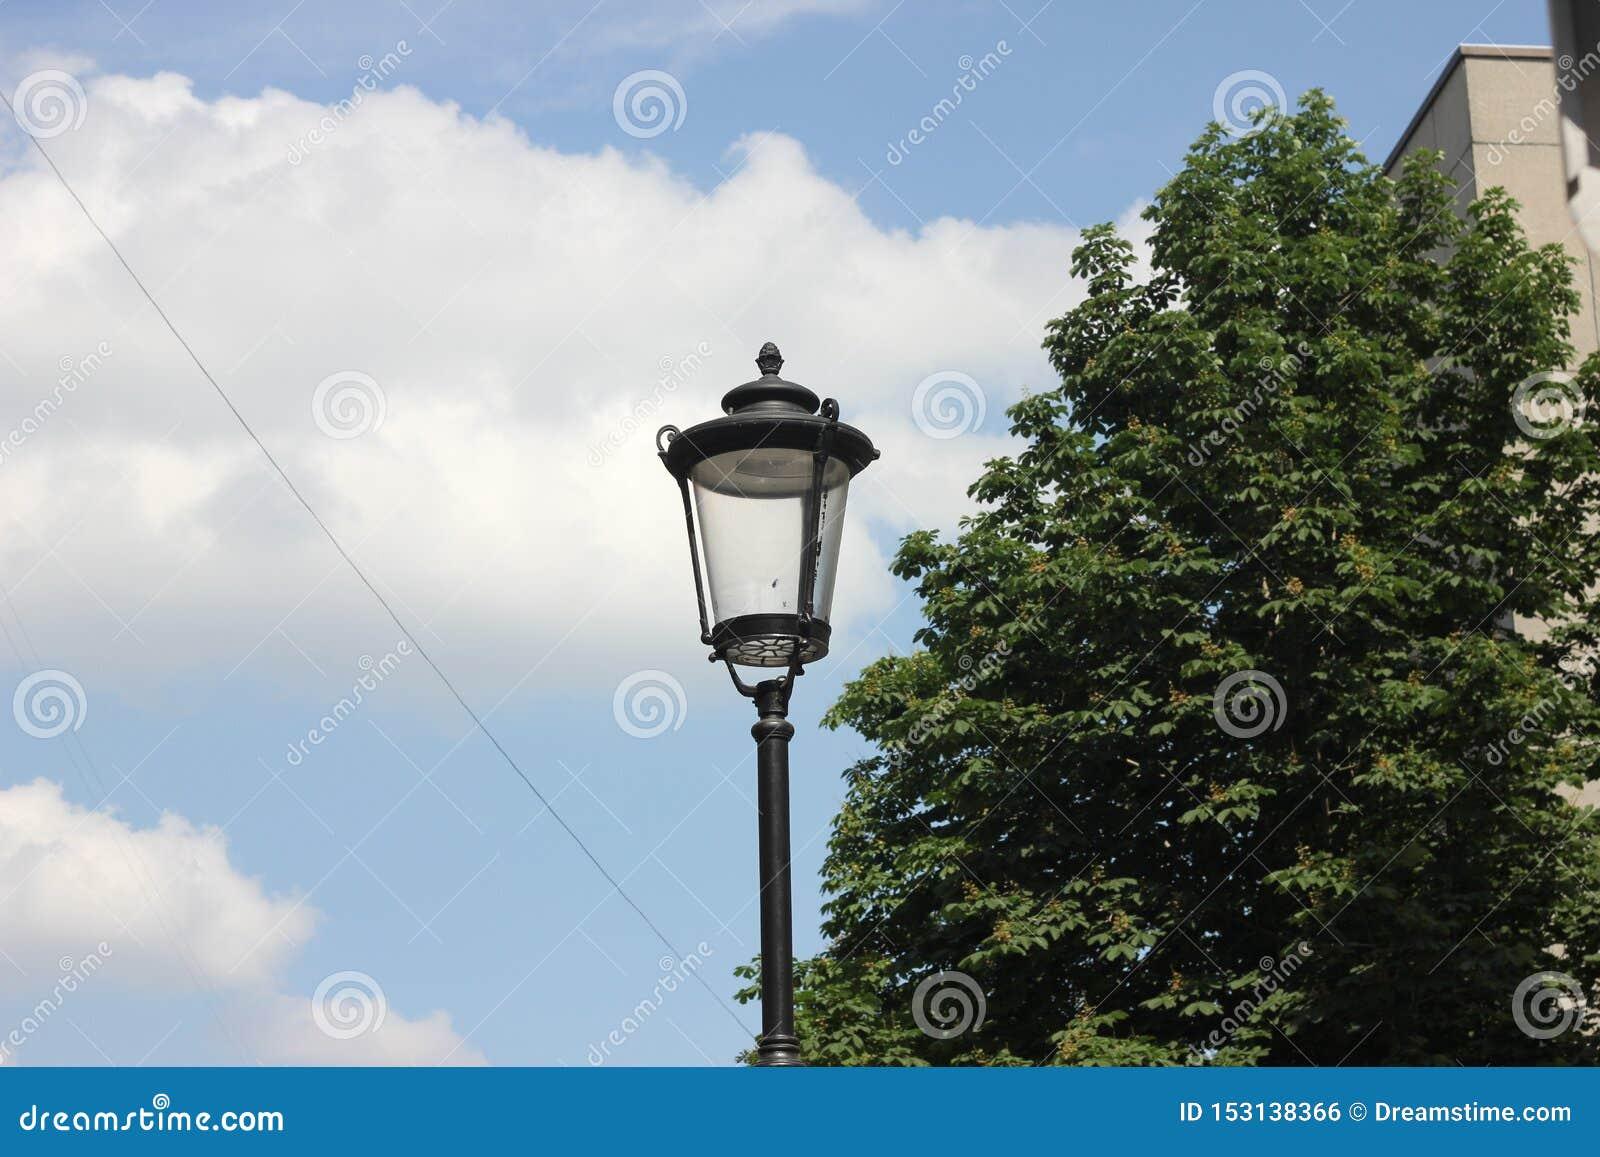 Street retro lamp against the blue sky